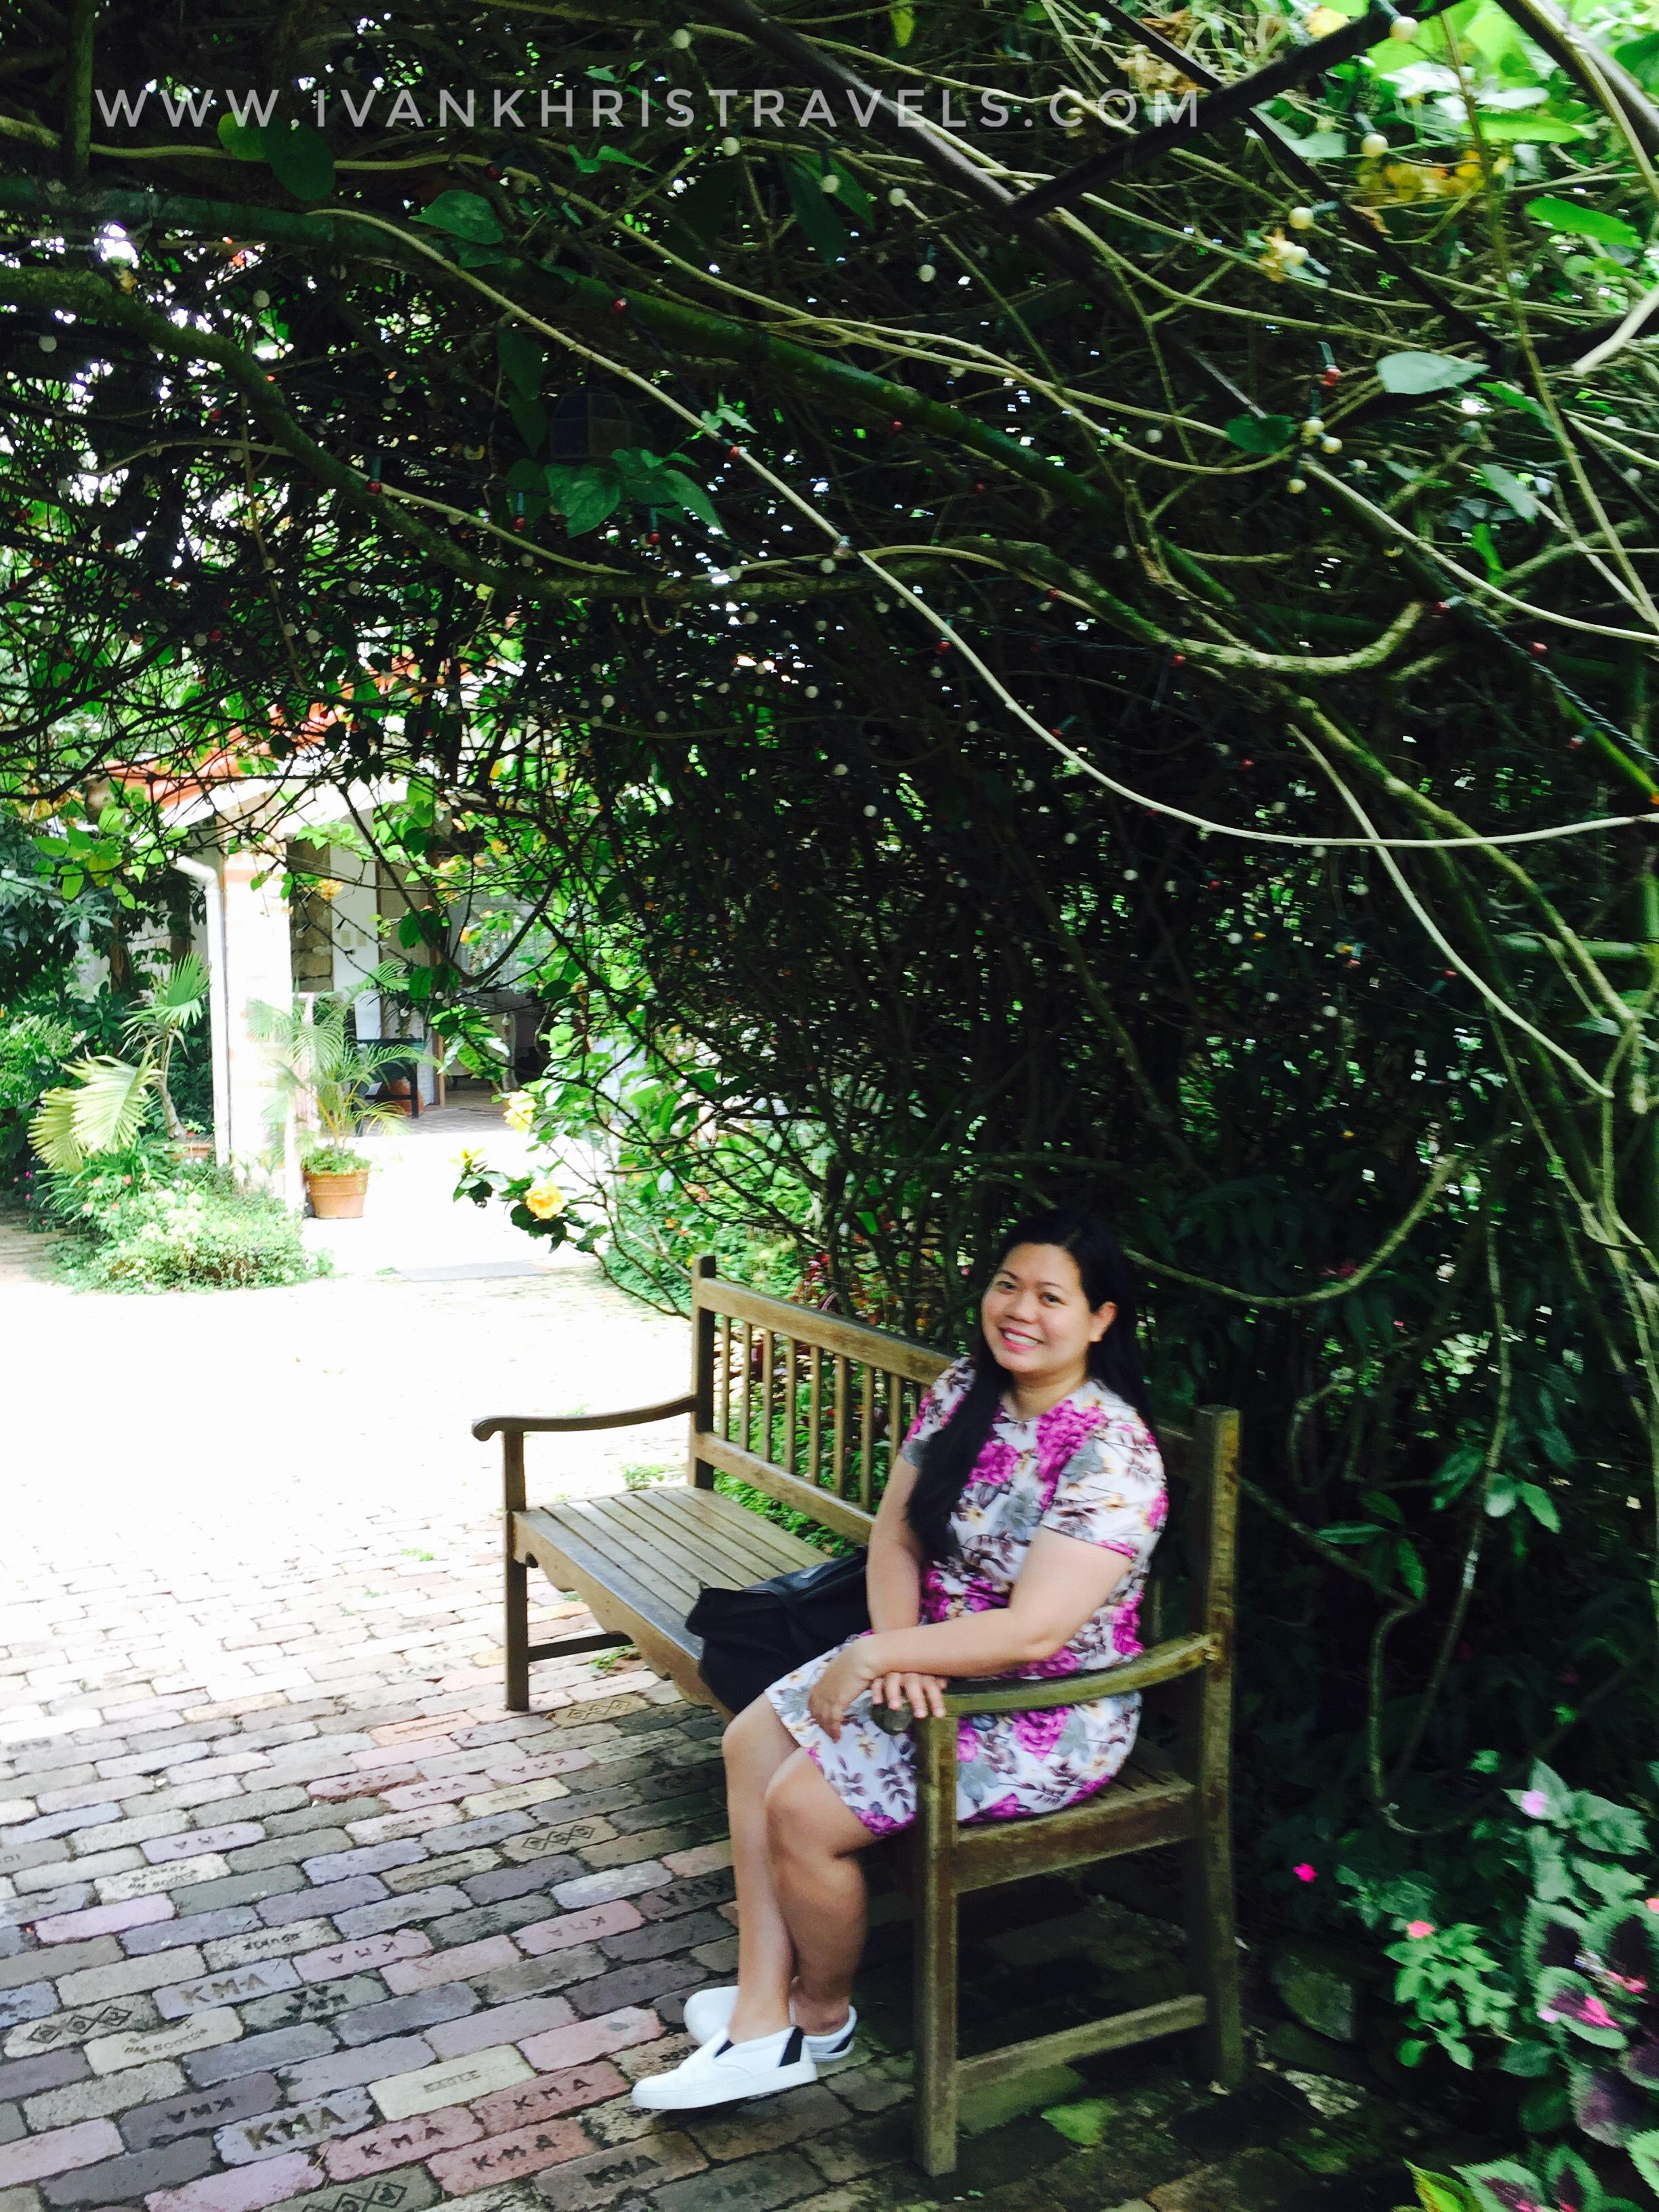 Sonya's Garden garden bench